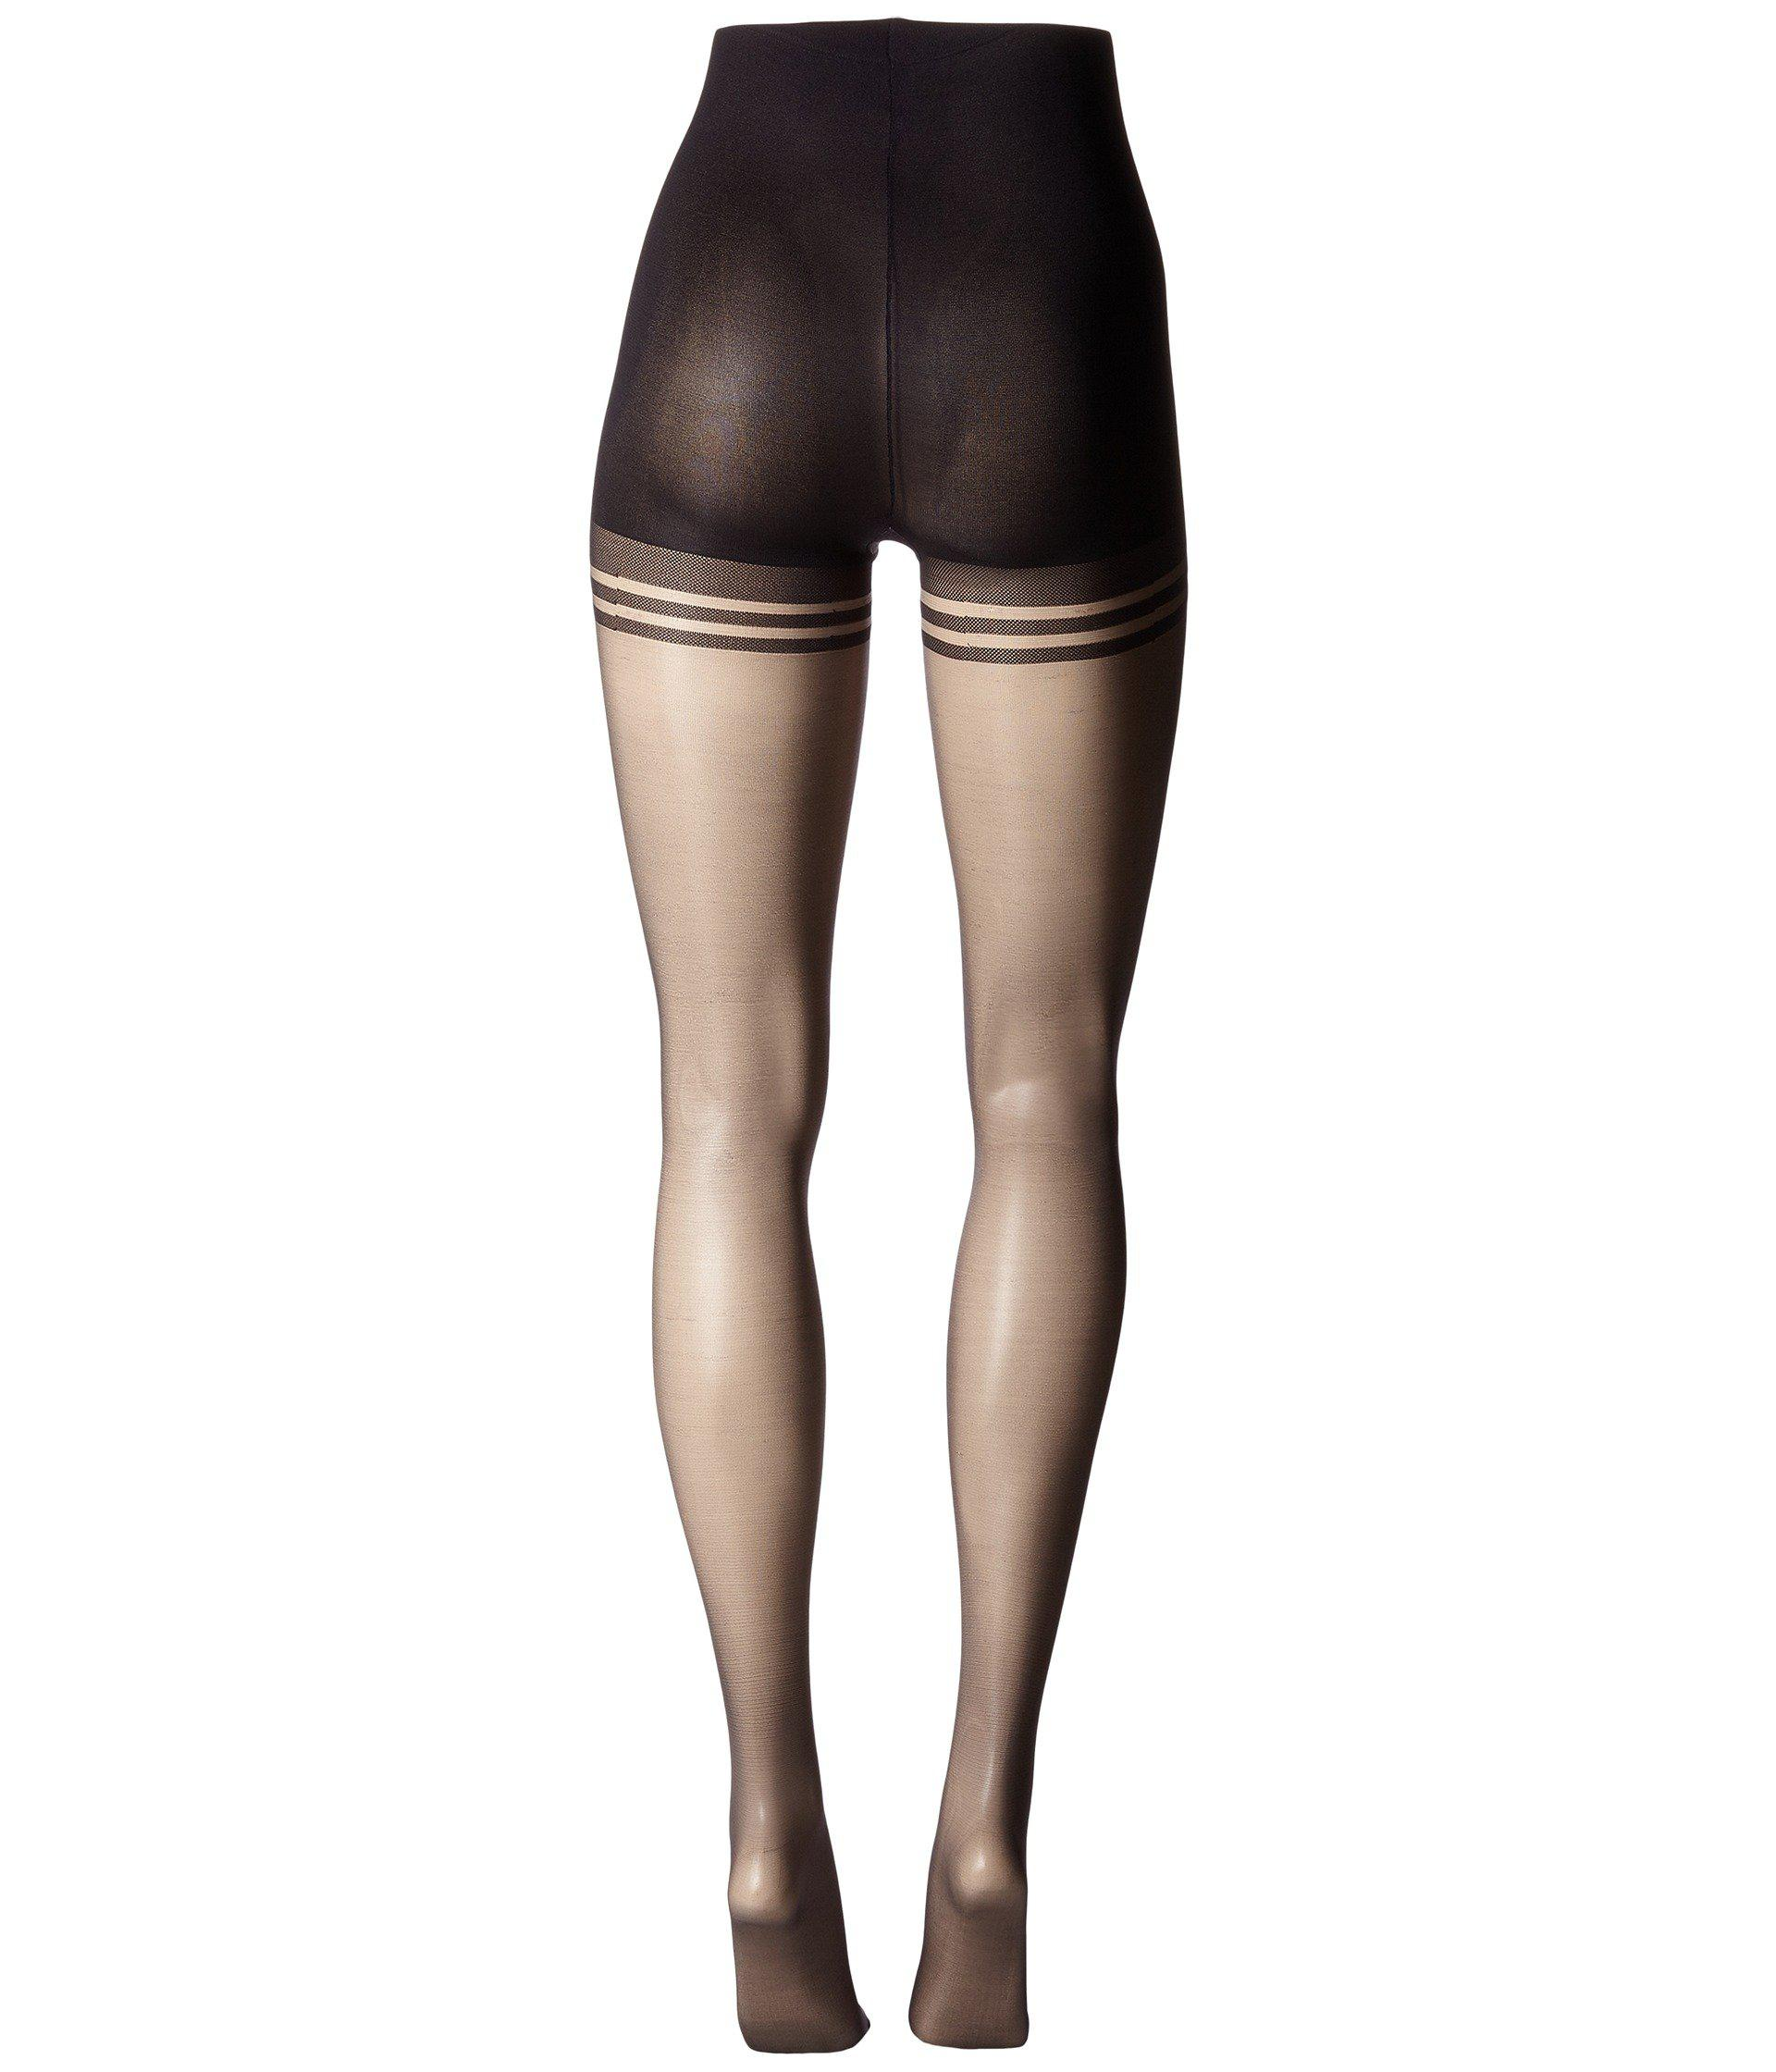 471924c1da5 Pretty Polly Nylons 10 Denier Slimmer Gloss Tights (black) Hose in ...